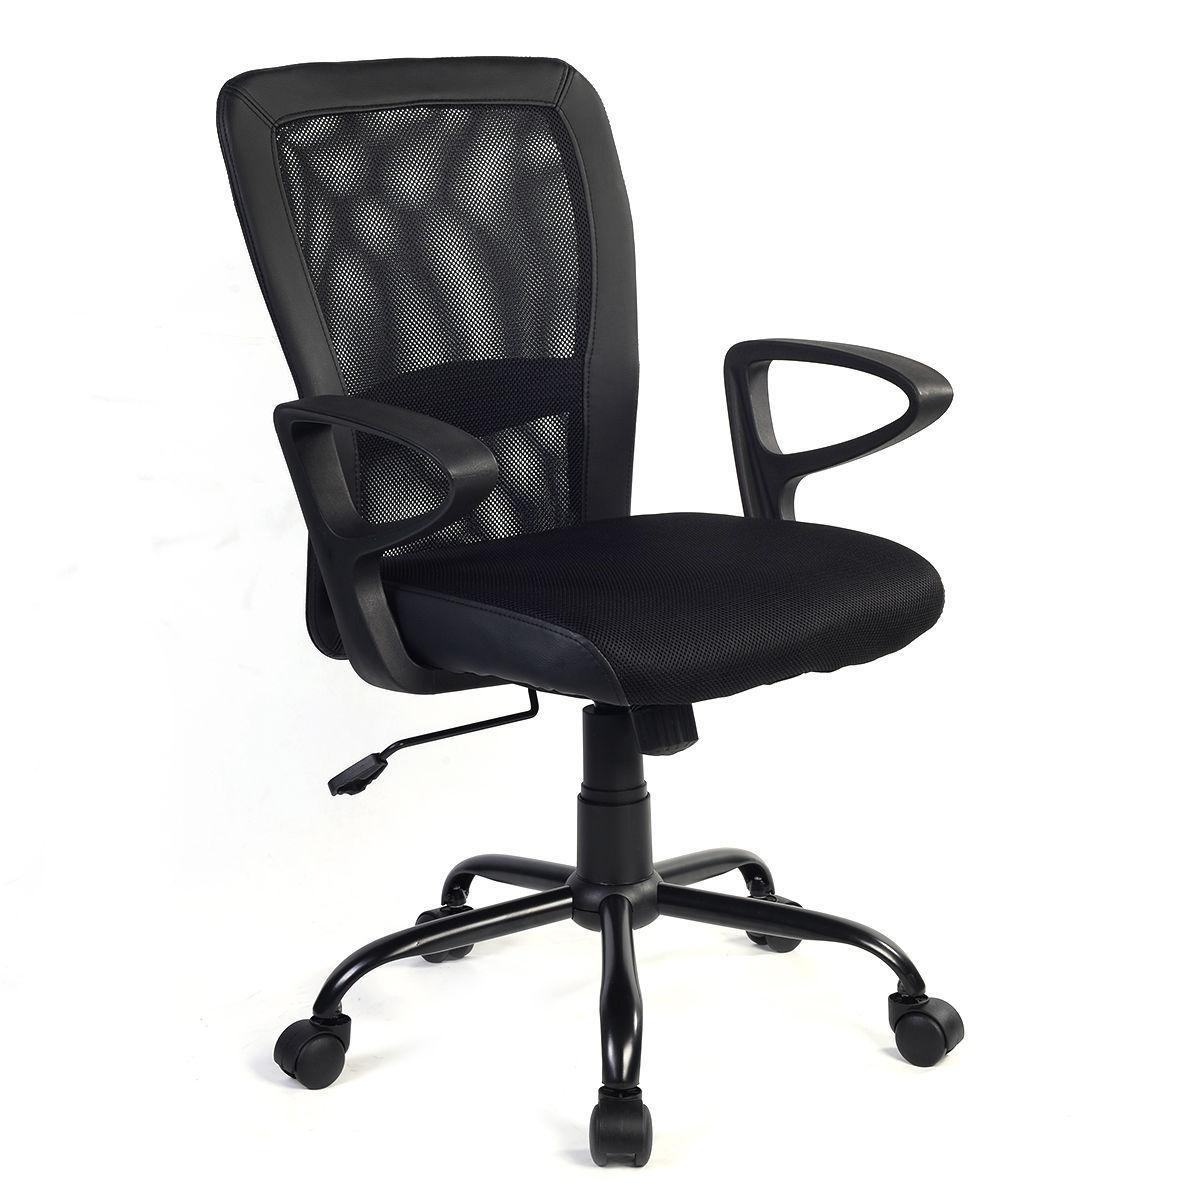 Giantex Modern Ergonomic Mesh Medium Back Office Chair Swivel Executive Computer Desk Task Chairs Office Furniture HW56131